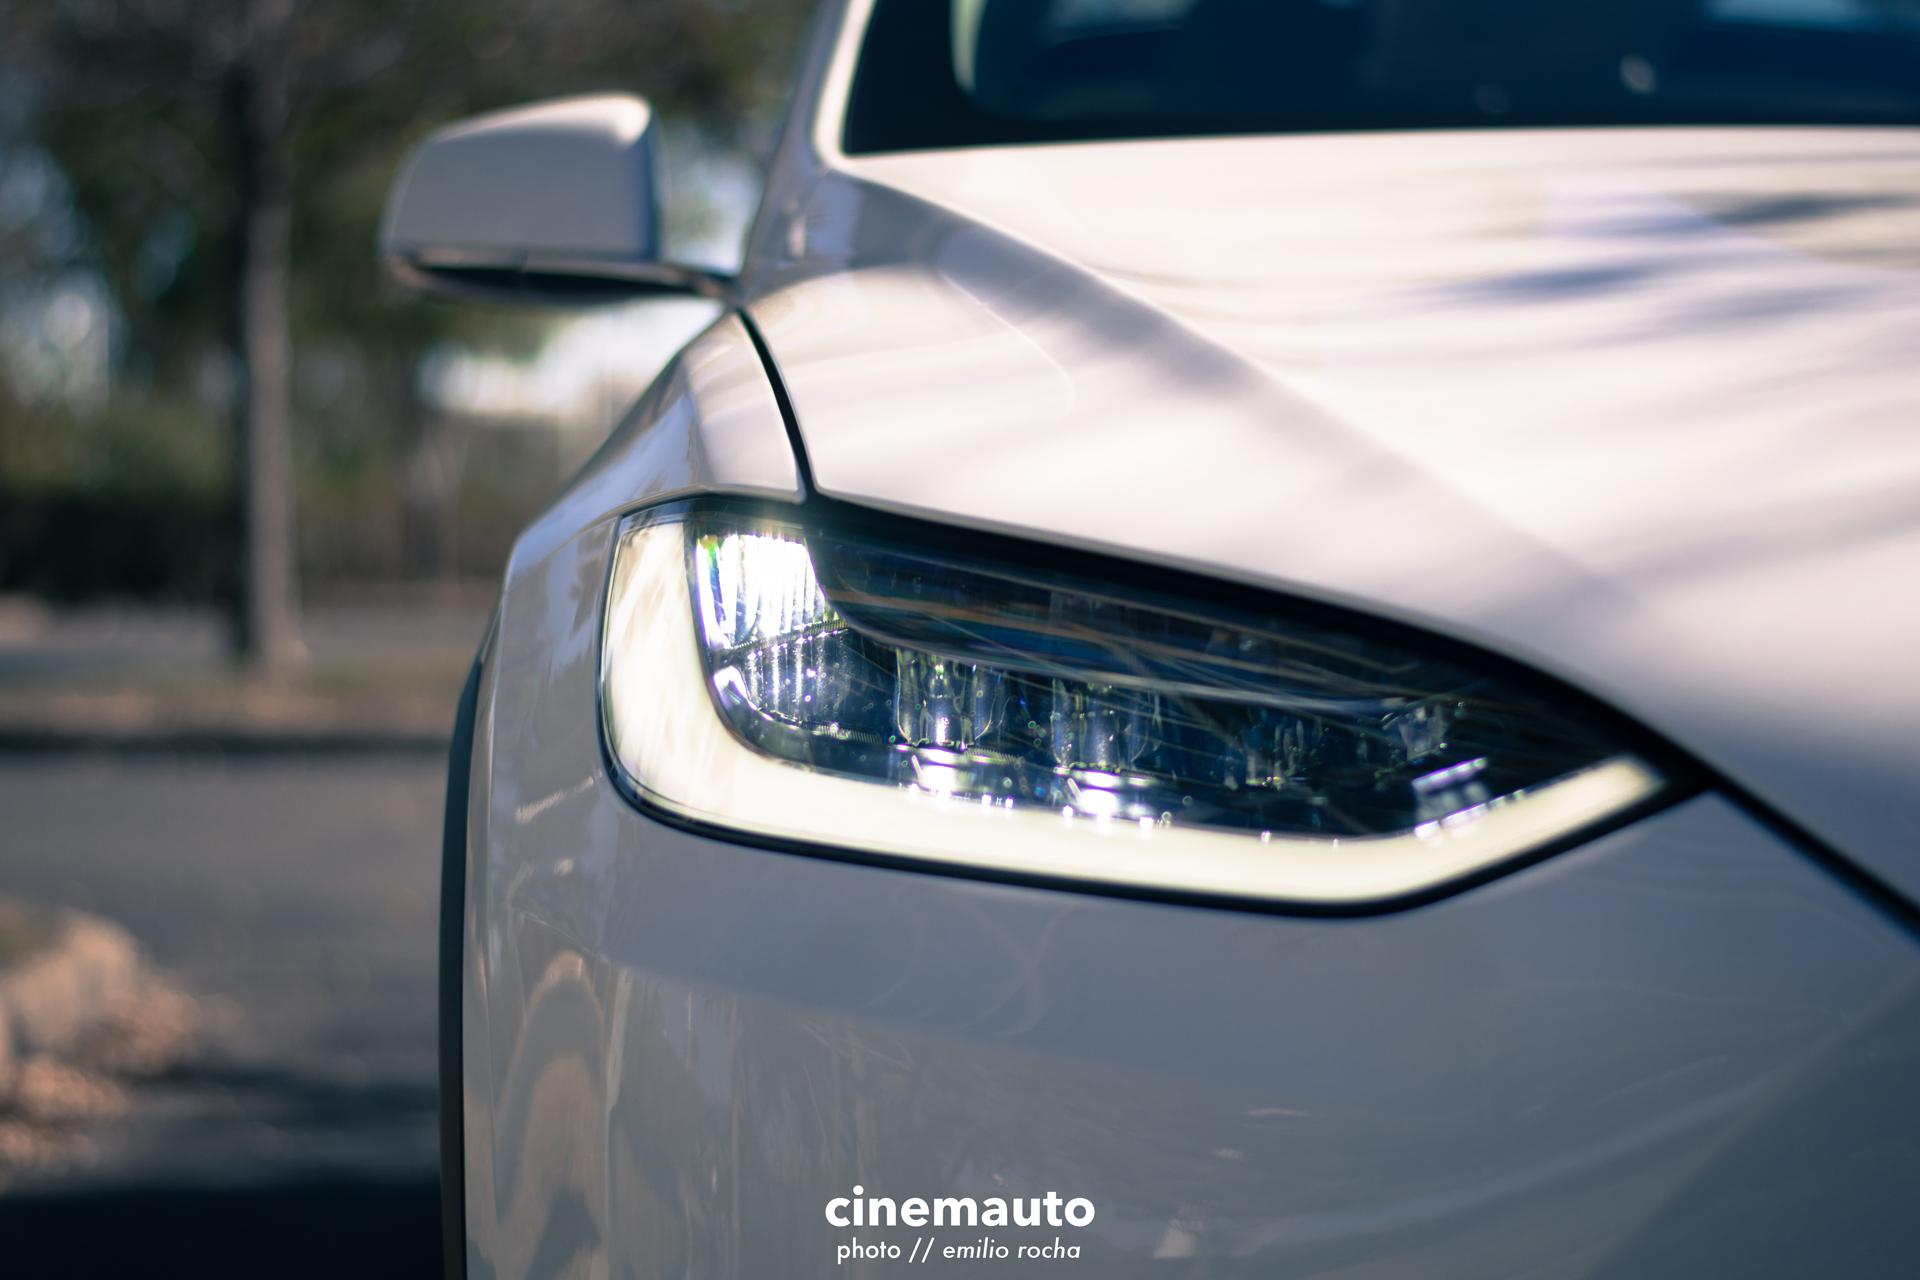 TeslaCinemauto-13.jpg